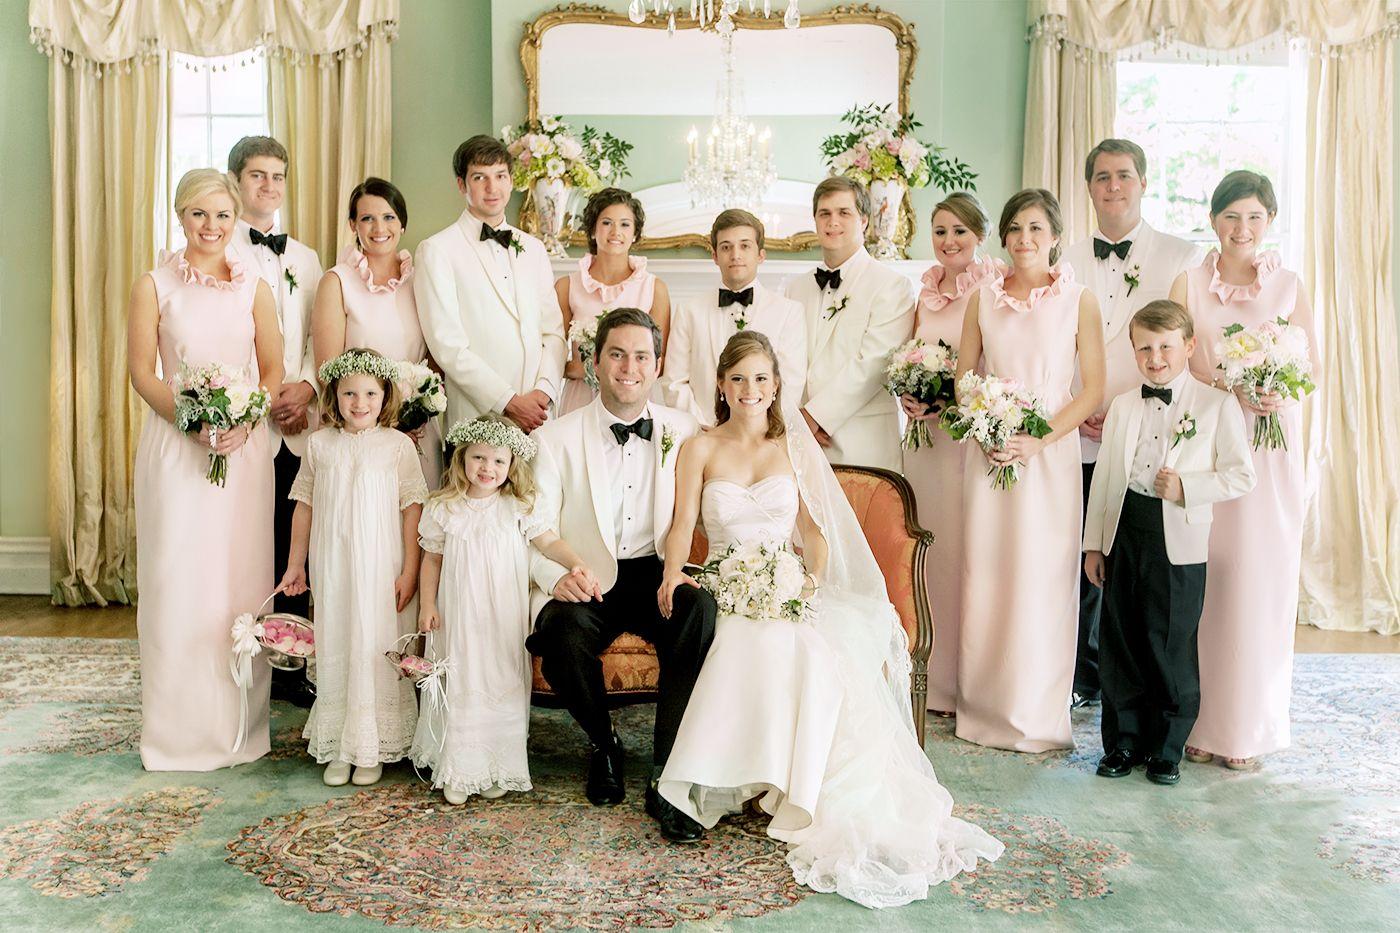 Augusta, GA wedding party. Camilyn Beth bridesmaids dresses. Anne ...